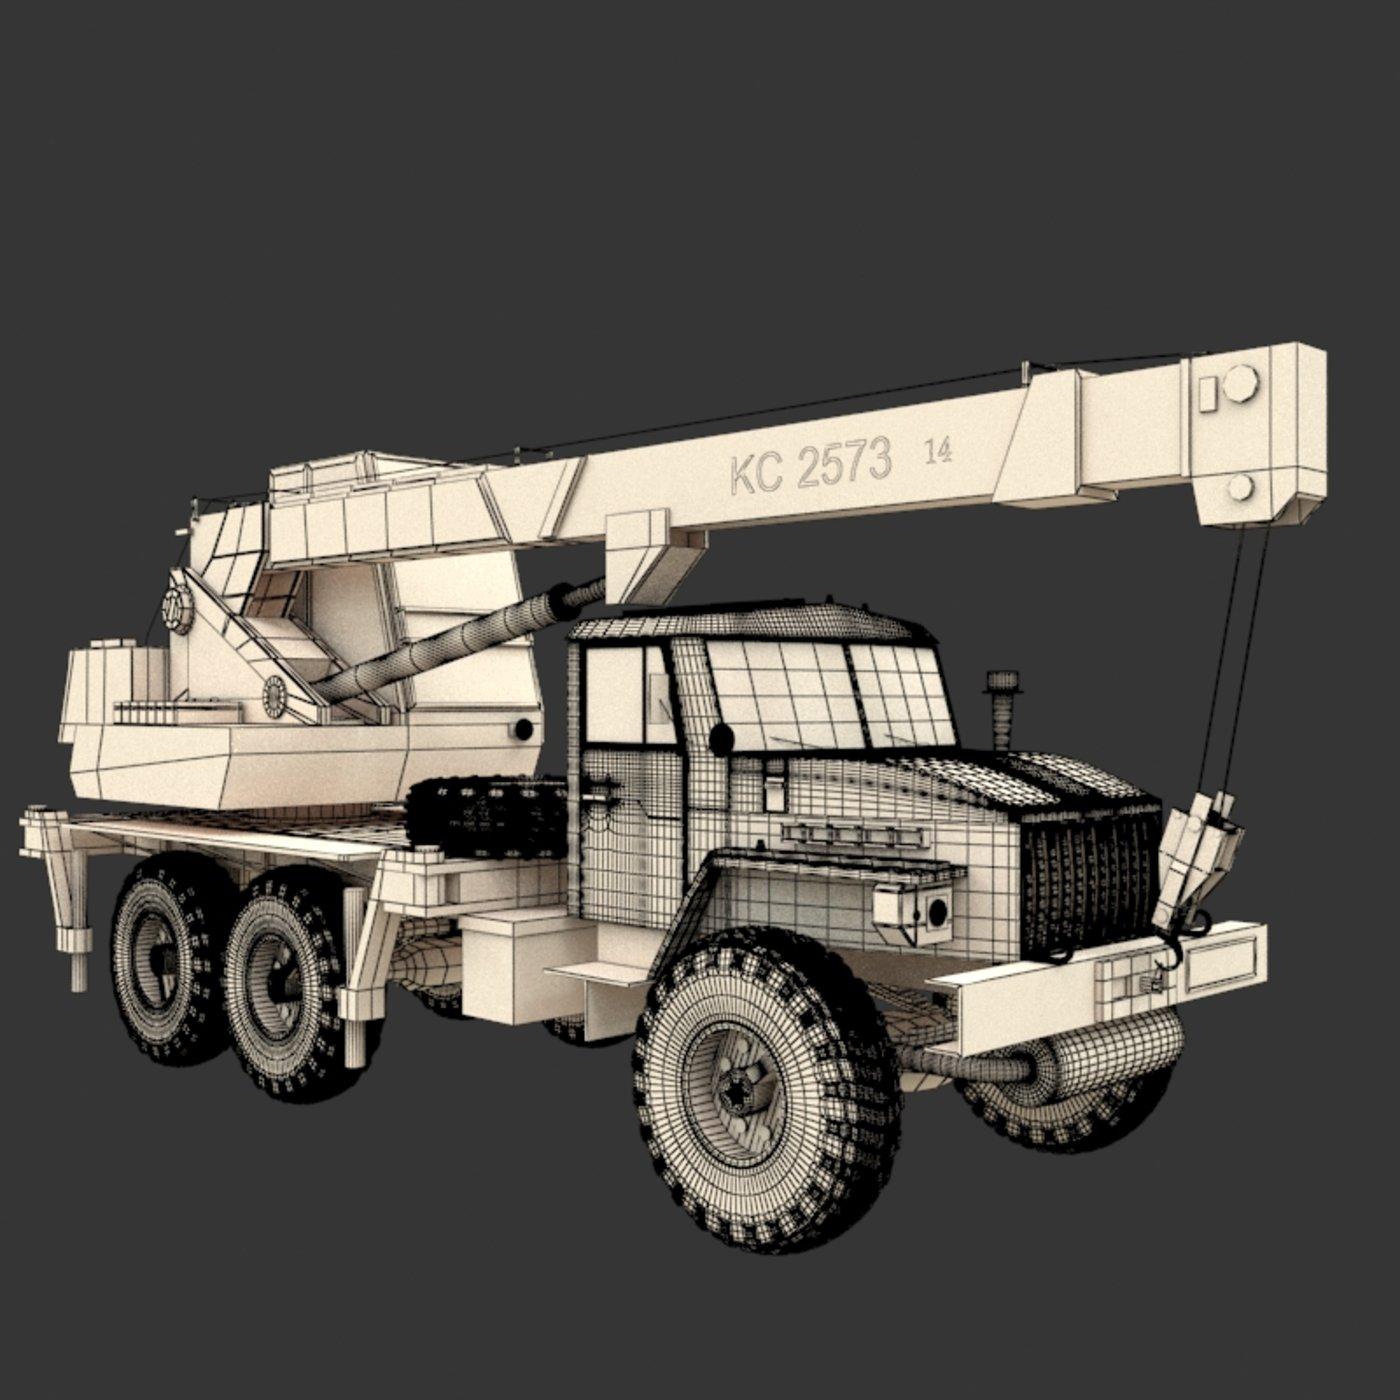 KS 2573 Auto Crane